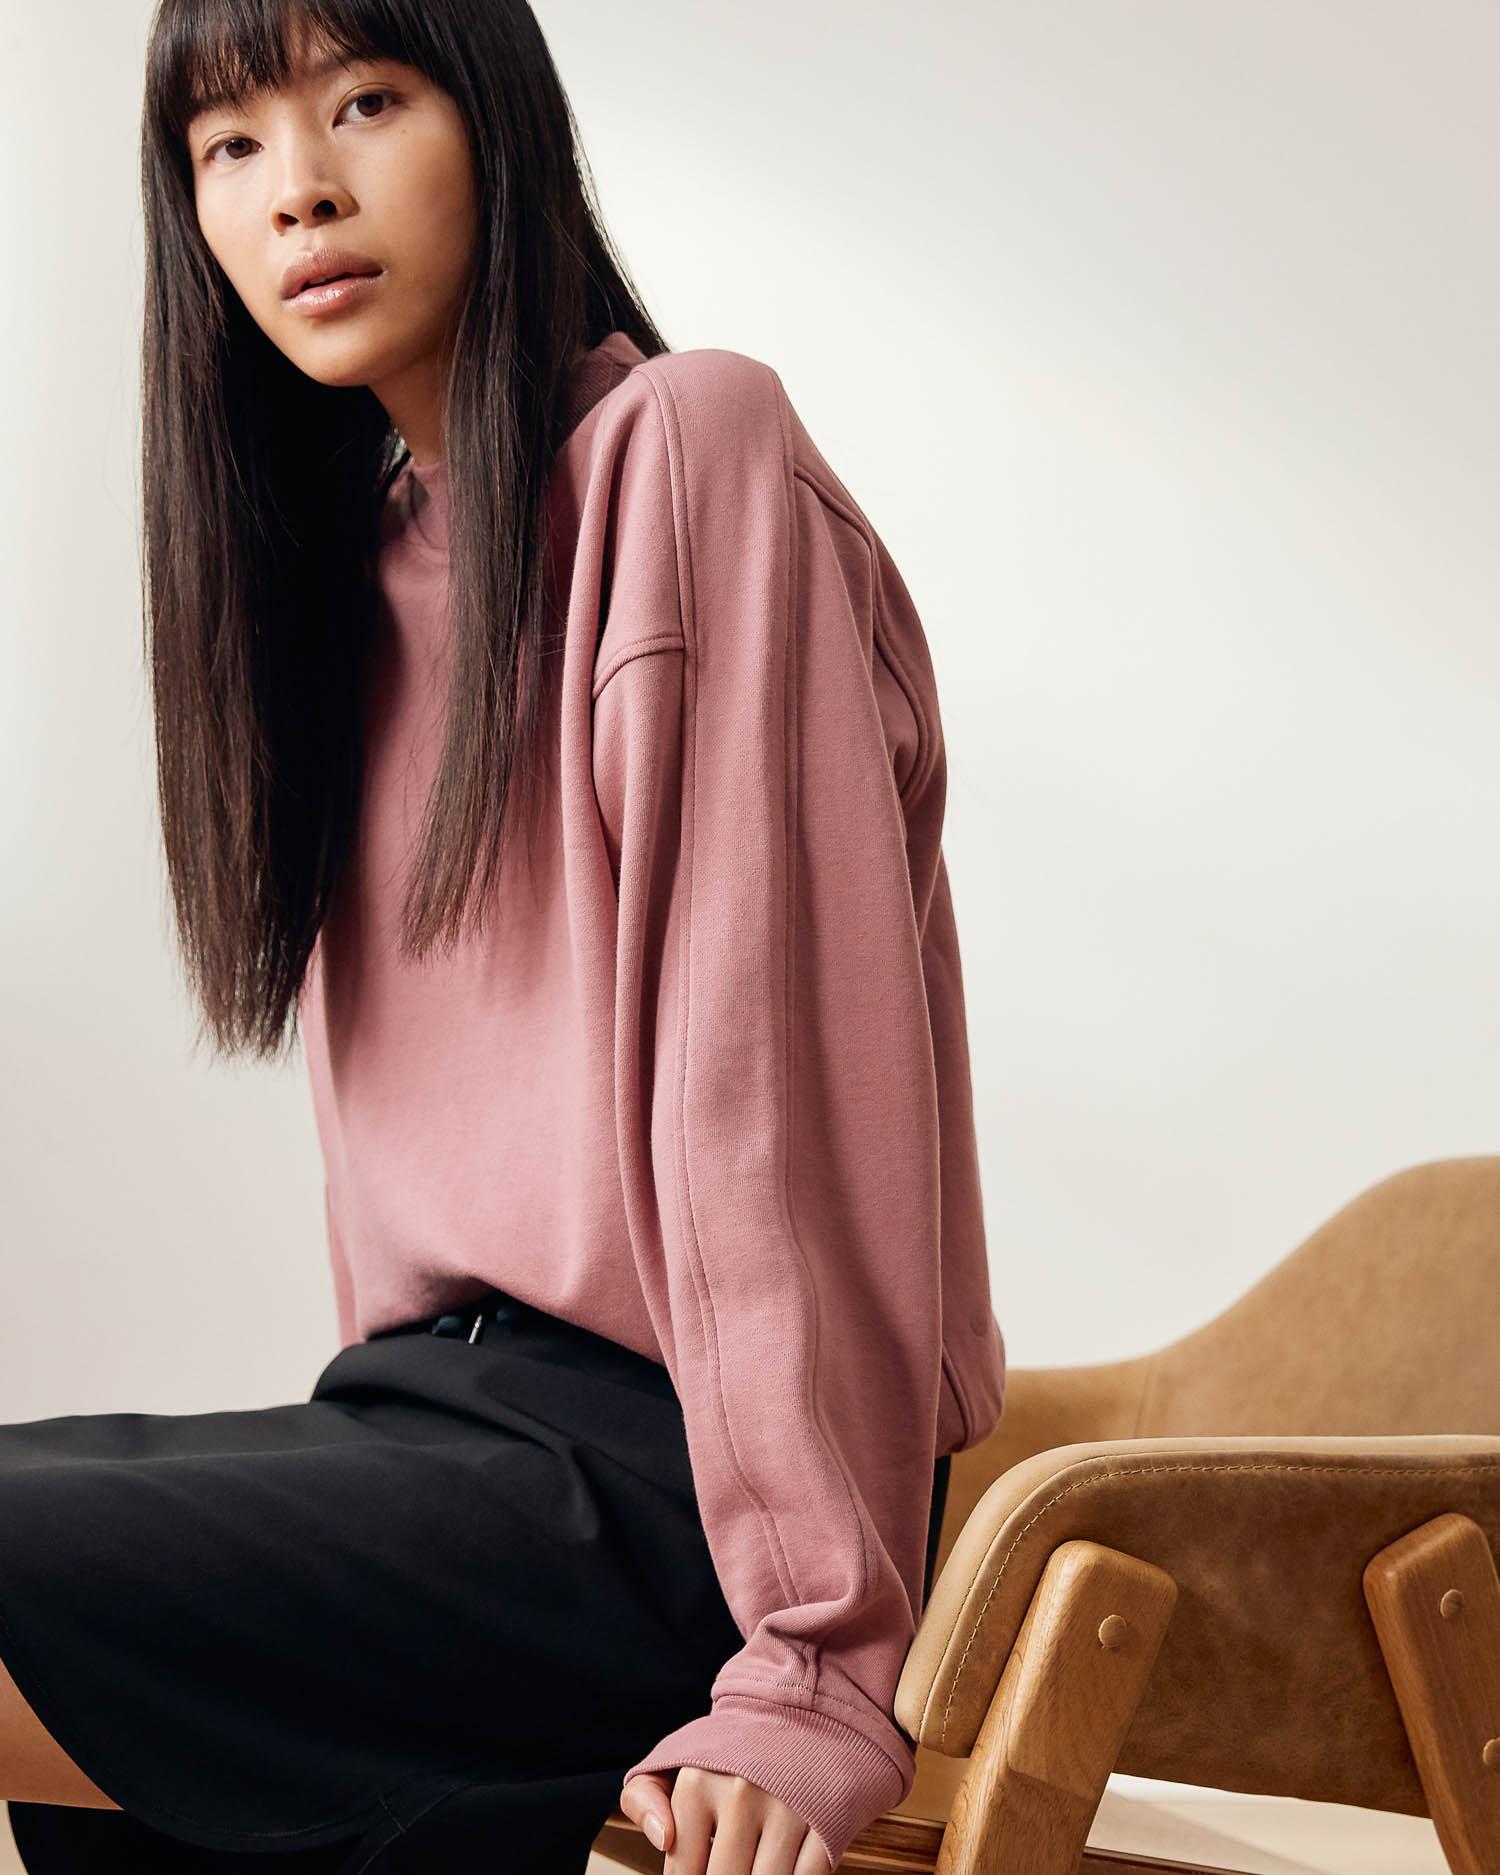 Diane-Chiu-and-Miriam-for-lululemon-sweaters-35173-MK-Matt-Korinek-Photography-Copyright-2019-SQSP-1500px.jpg